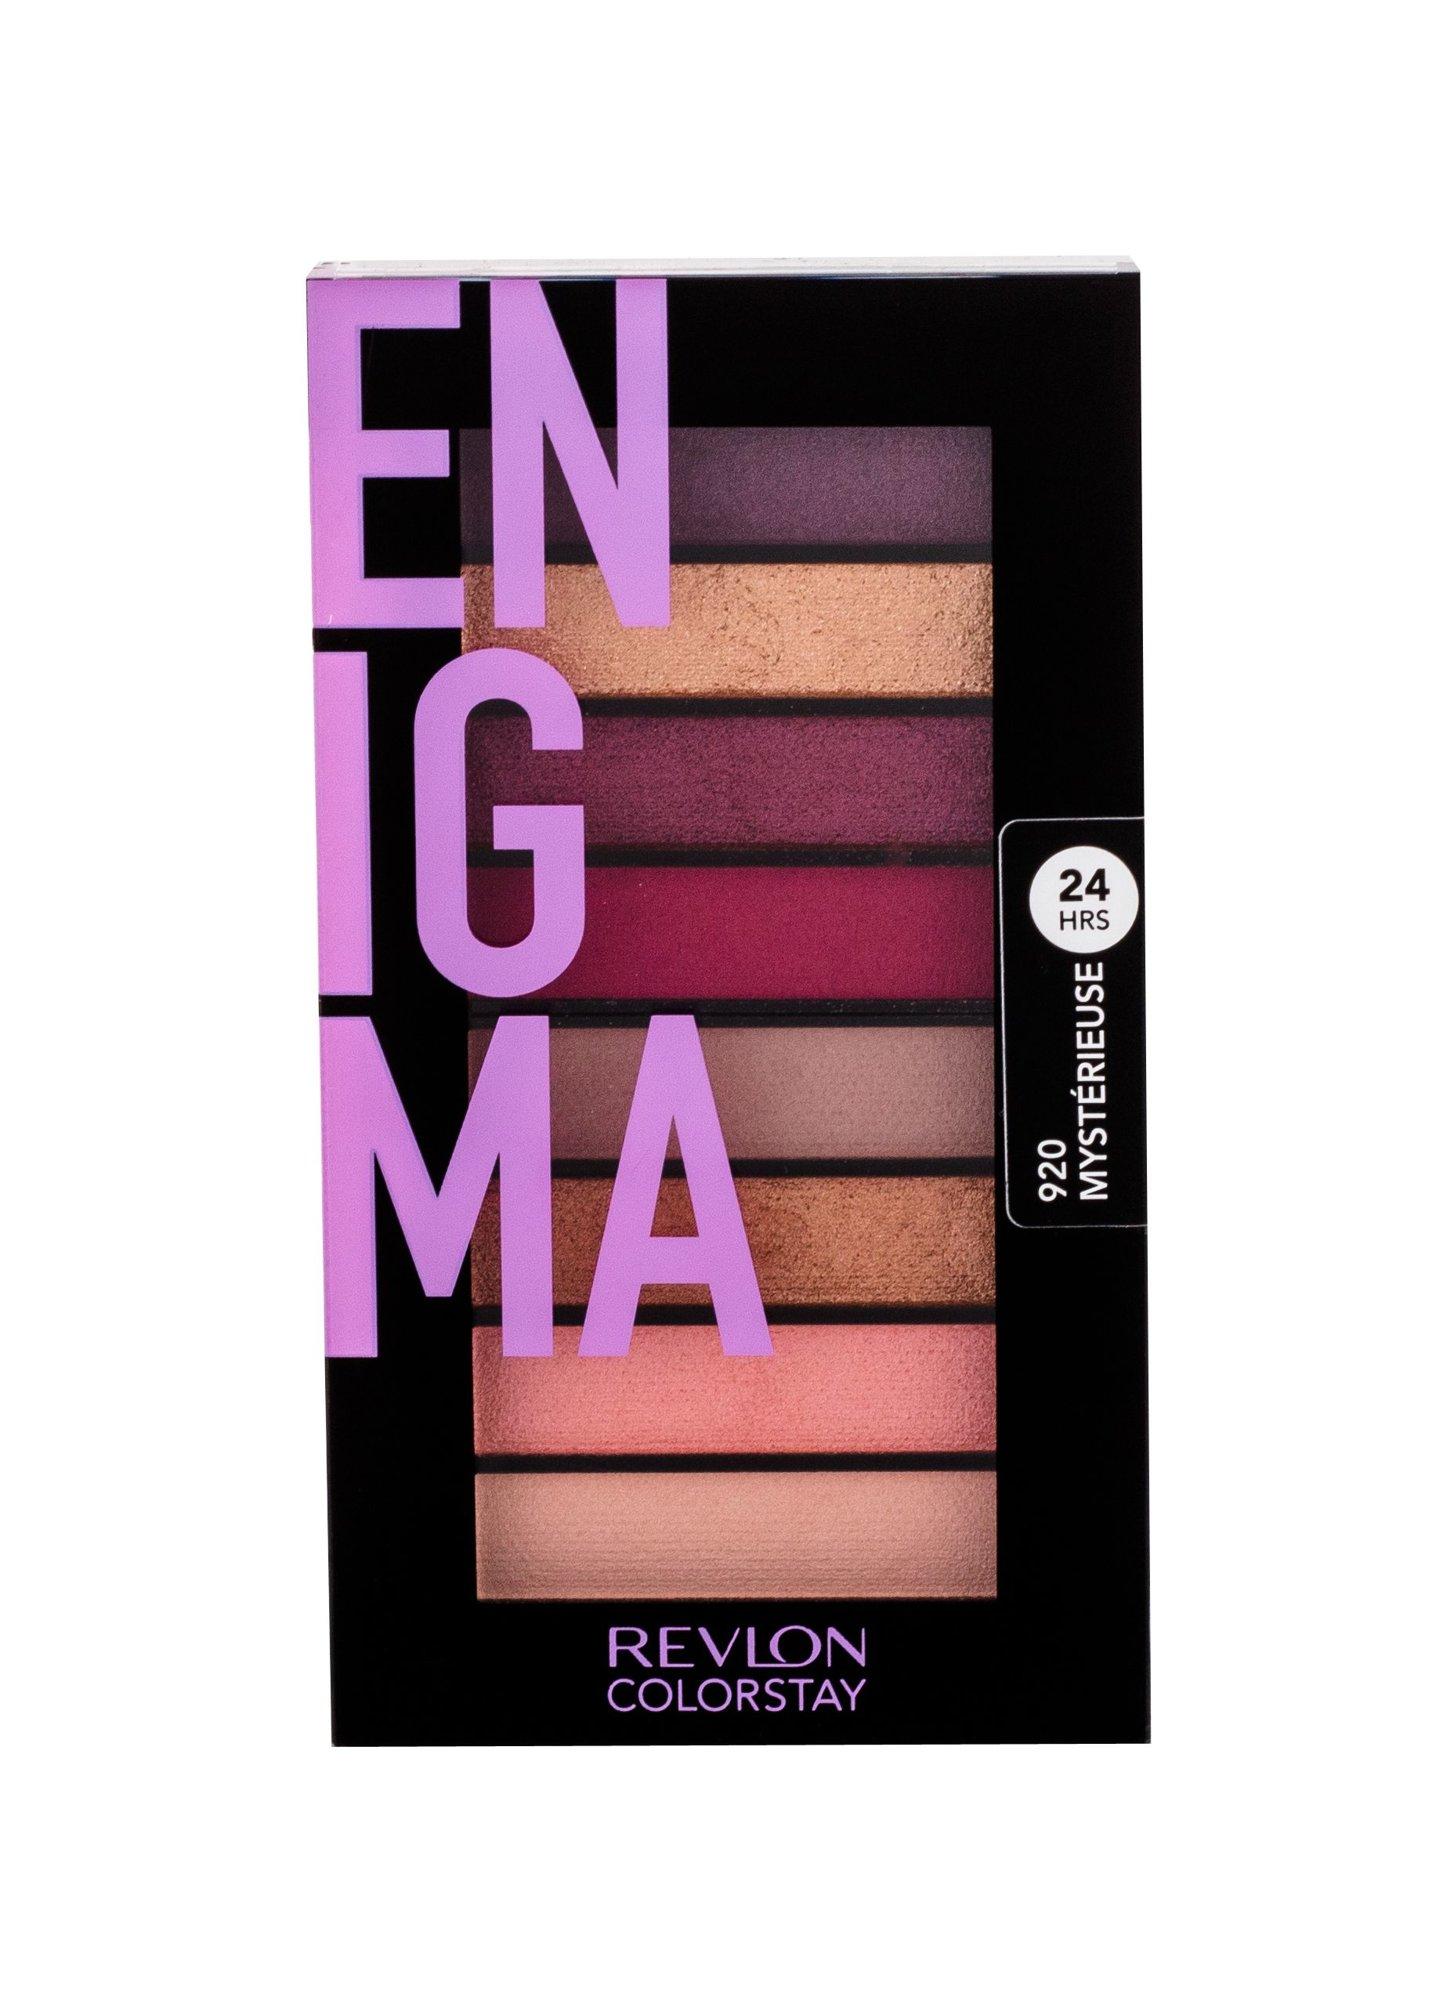 Revlon Colorstay Eye Shadow 3,4ml 920 Enigma